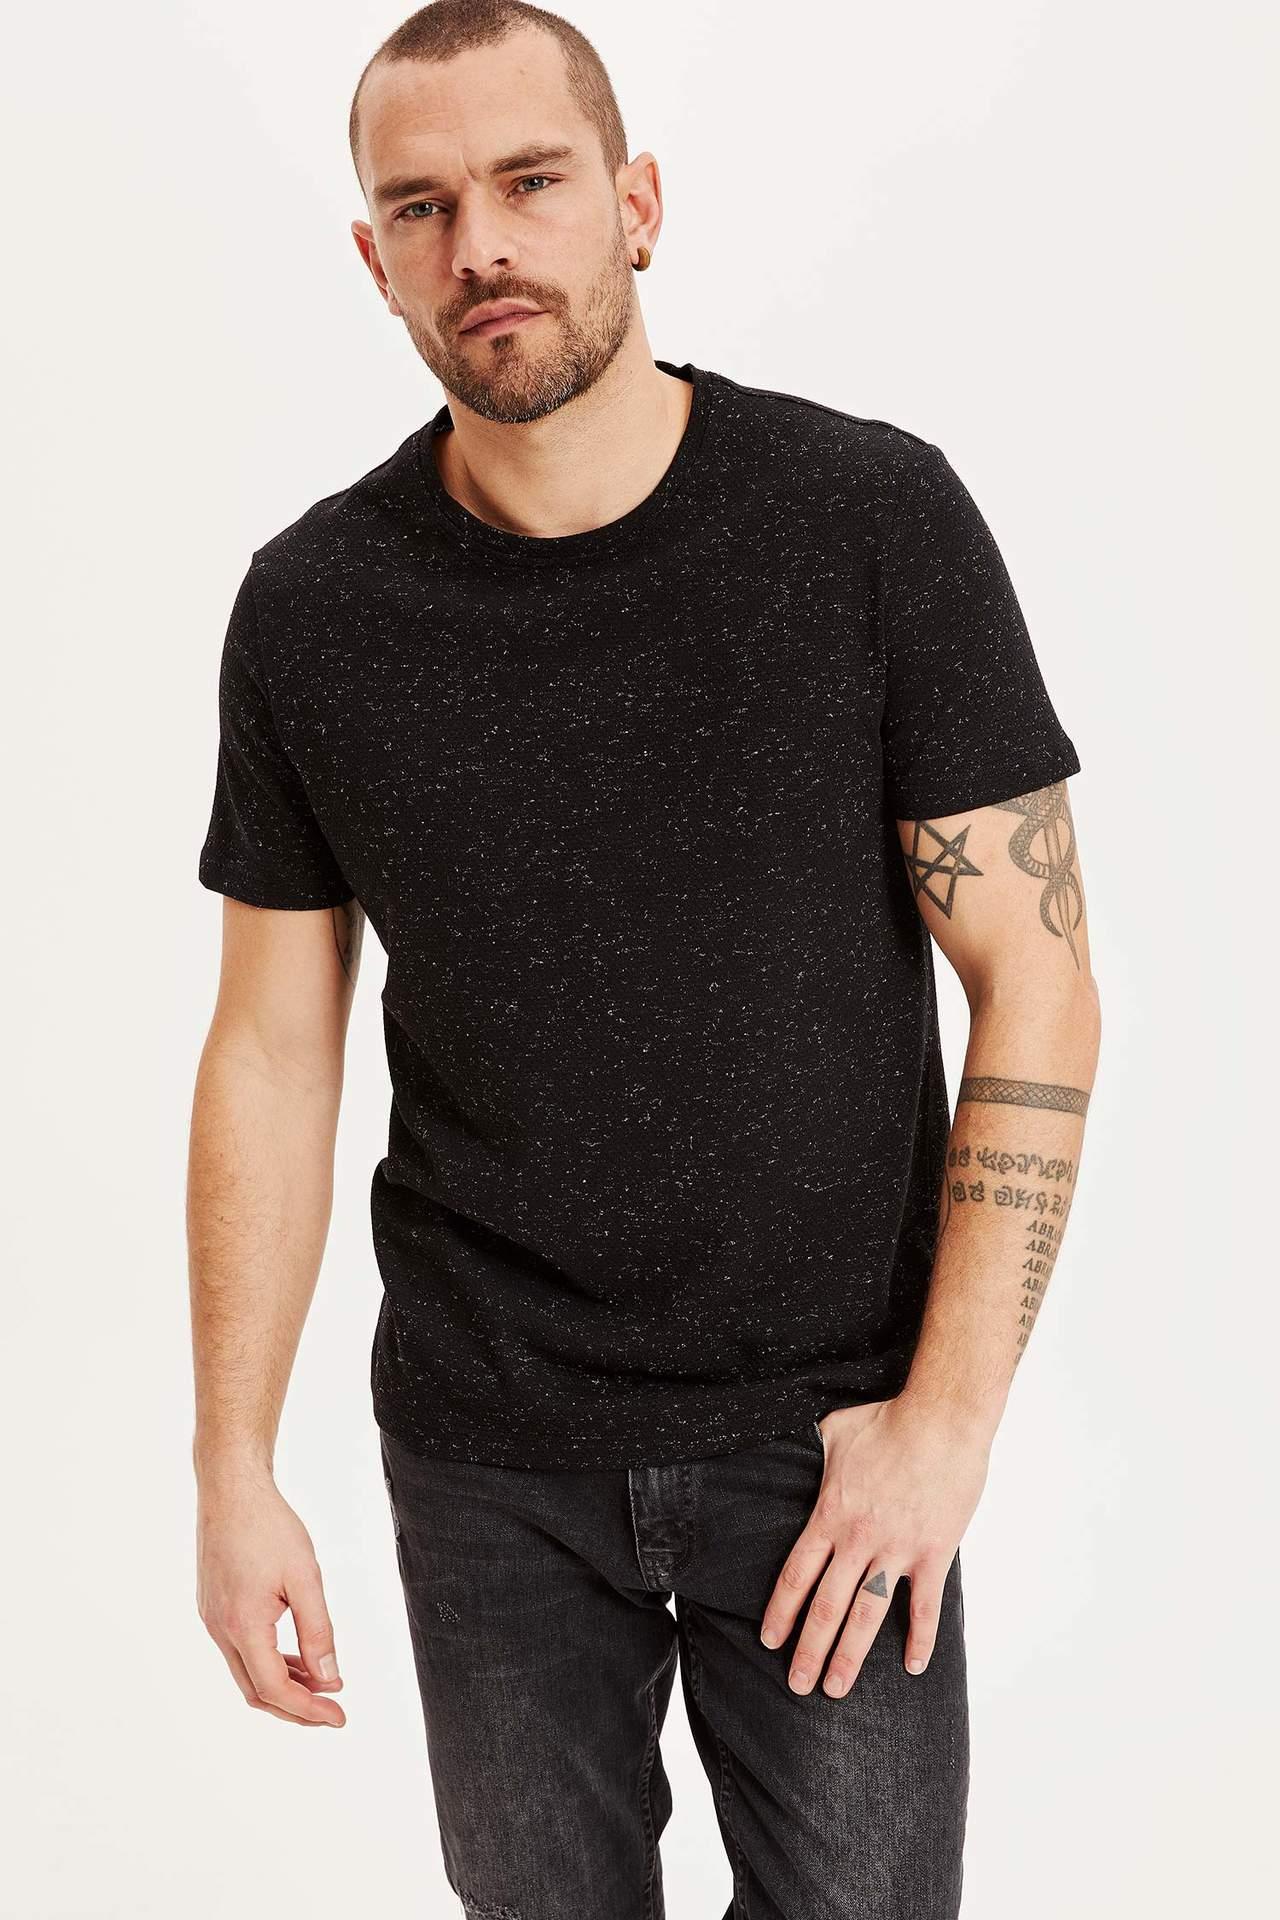 DeFacto Erkek Slim Fit Kısa Kollu T-shirt Siyah male